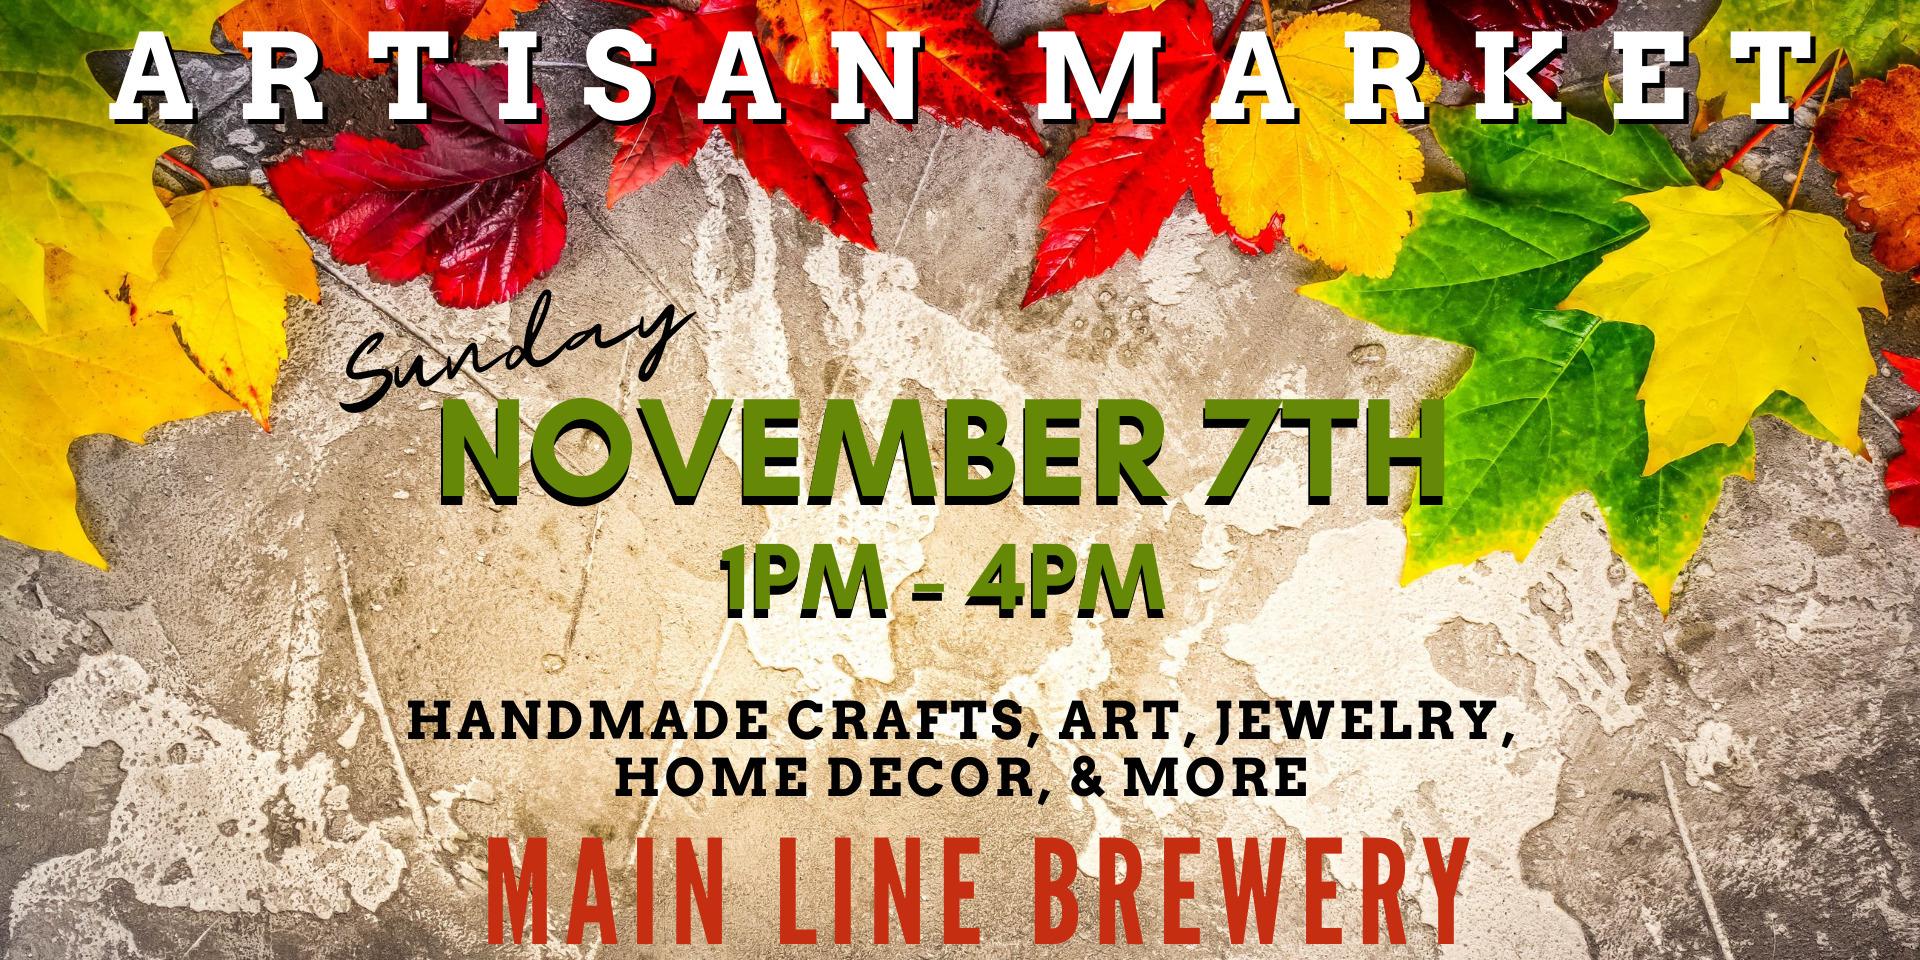 Sunday Artisan Market at Main Line Brewery